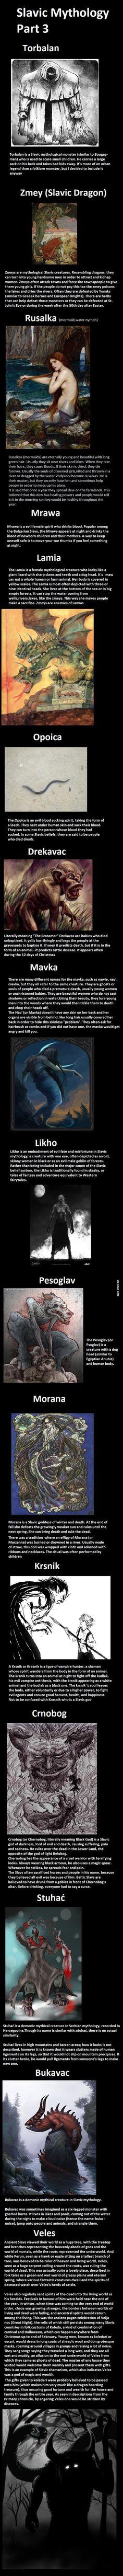 Slavic Mythology, monsters and gods, part 3